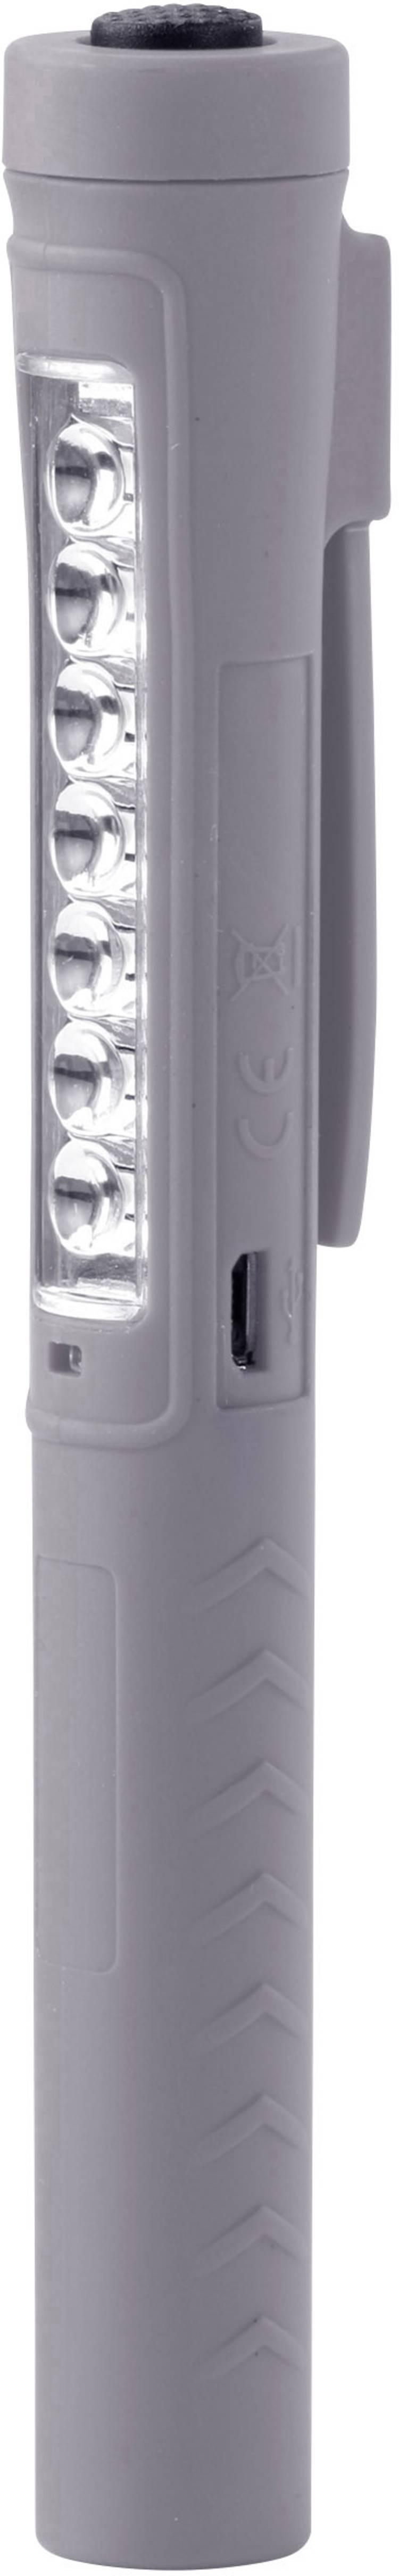 Werklamp werkt op een accu Ampercell AM 6649A 1 W